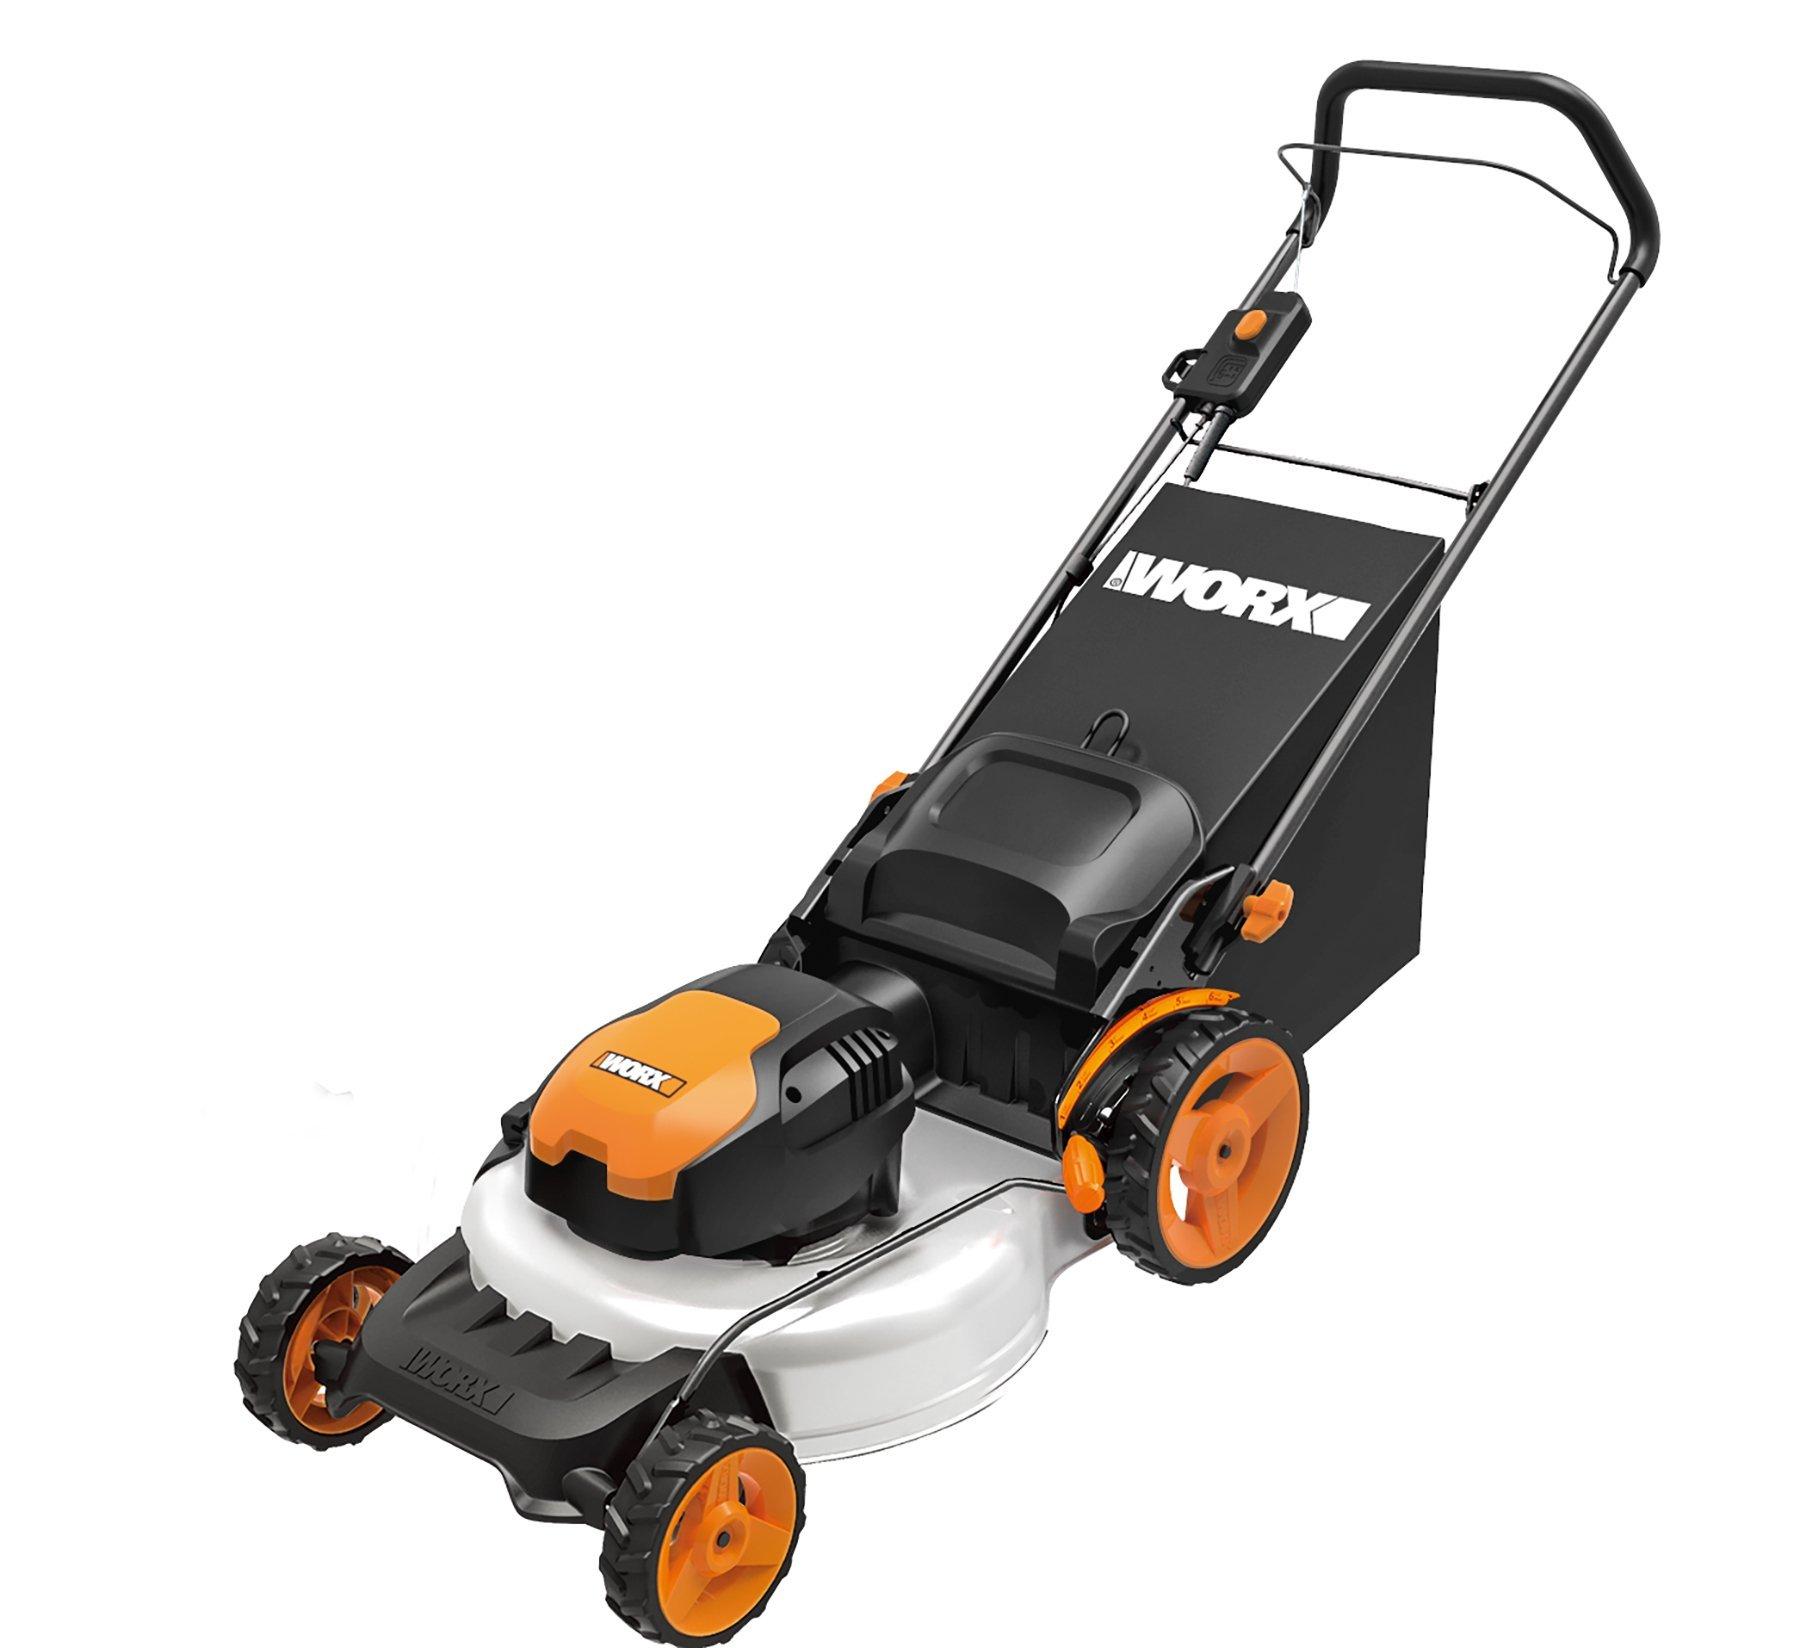 WORX WG720 12 Amp Electric Lawn Mower, 19''